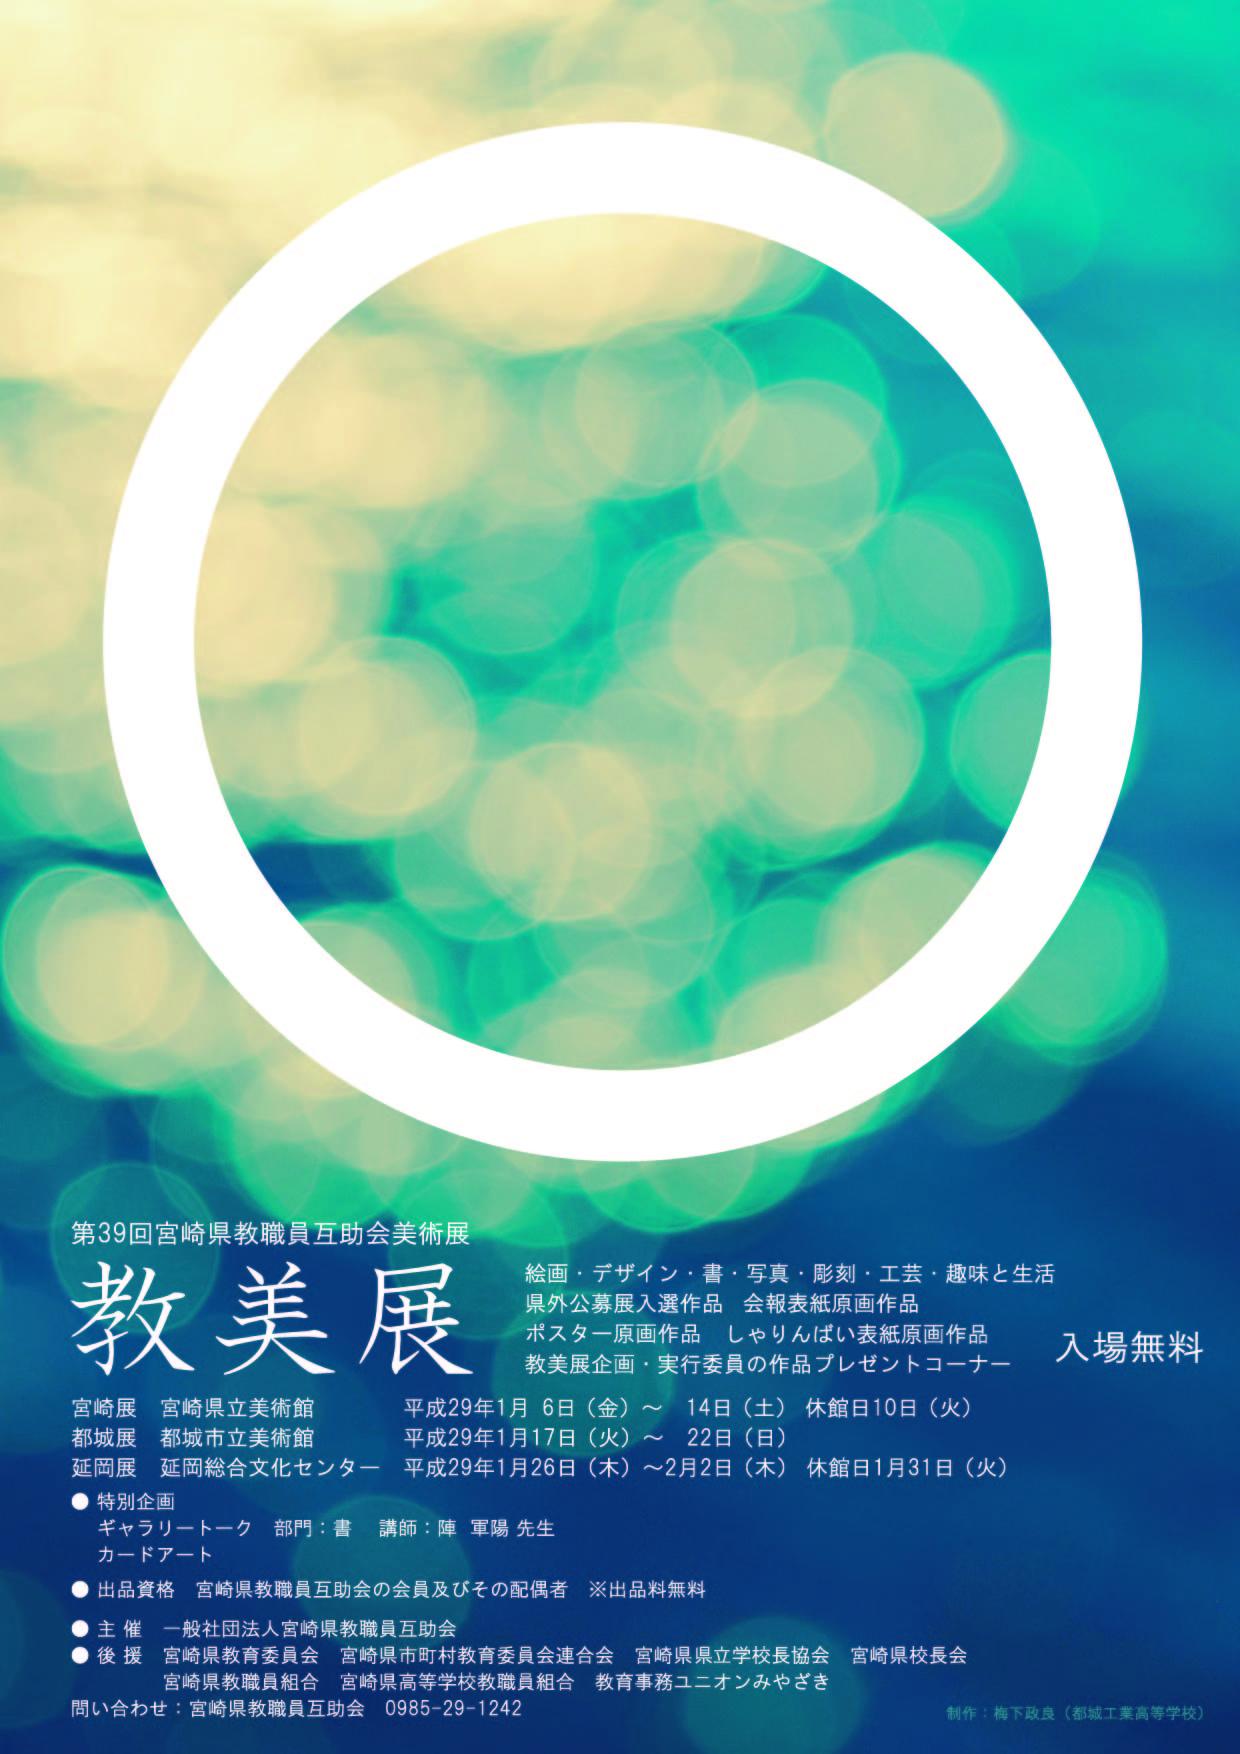 http://www.miyazaki-kyogo.or.jp/publiculture/exhibition/img/H28%E6%95%99%E7%BE%8E%E5%B1%95%E3%83%81%E3%83%A9%E3%82%B7.jpg